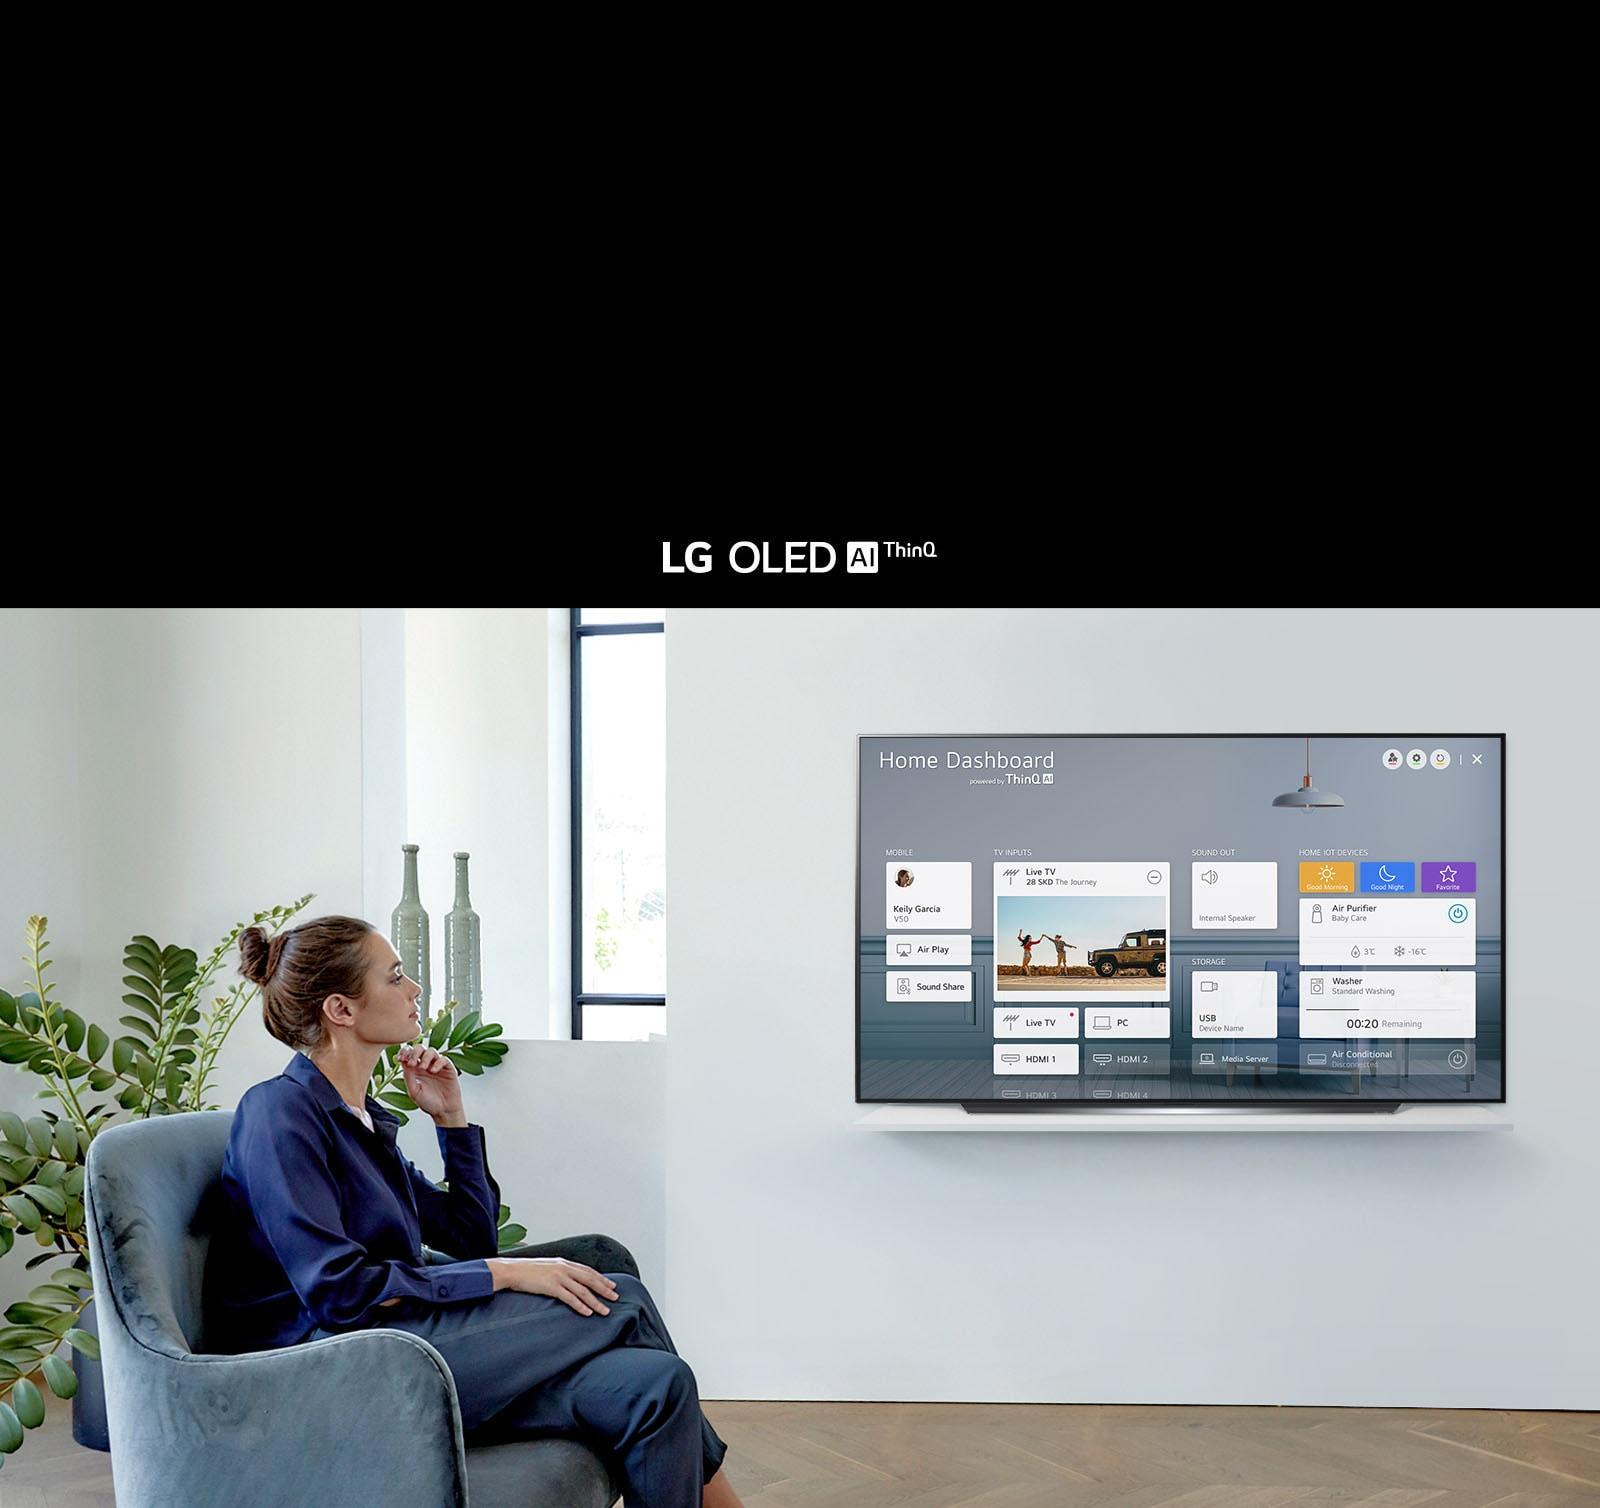 Seorang perempuan sedang duduk di kursi pada sebuah ruang keluarga dengan layar TV menampilkan Home Dashboard